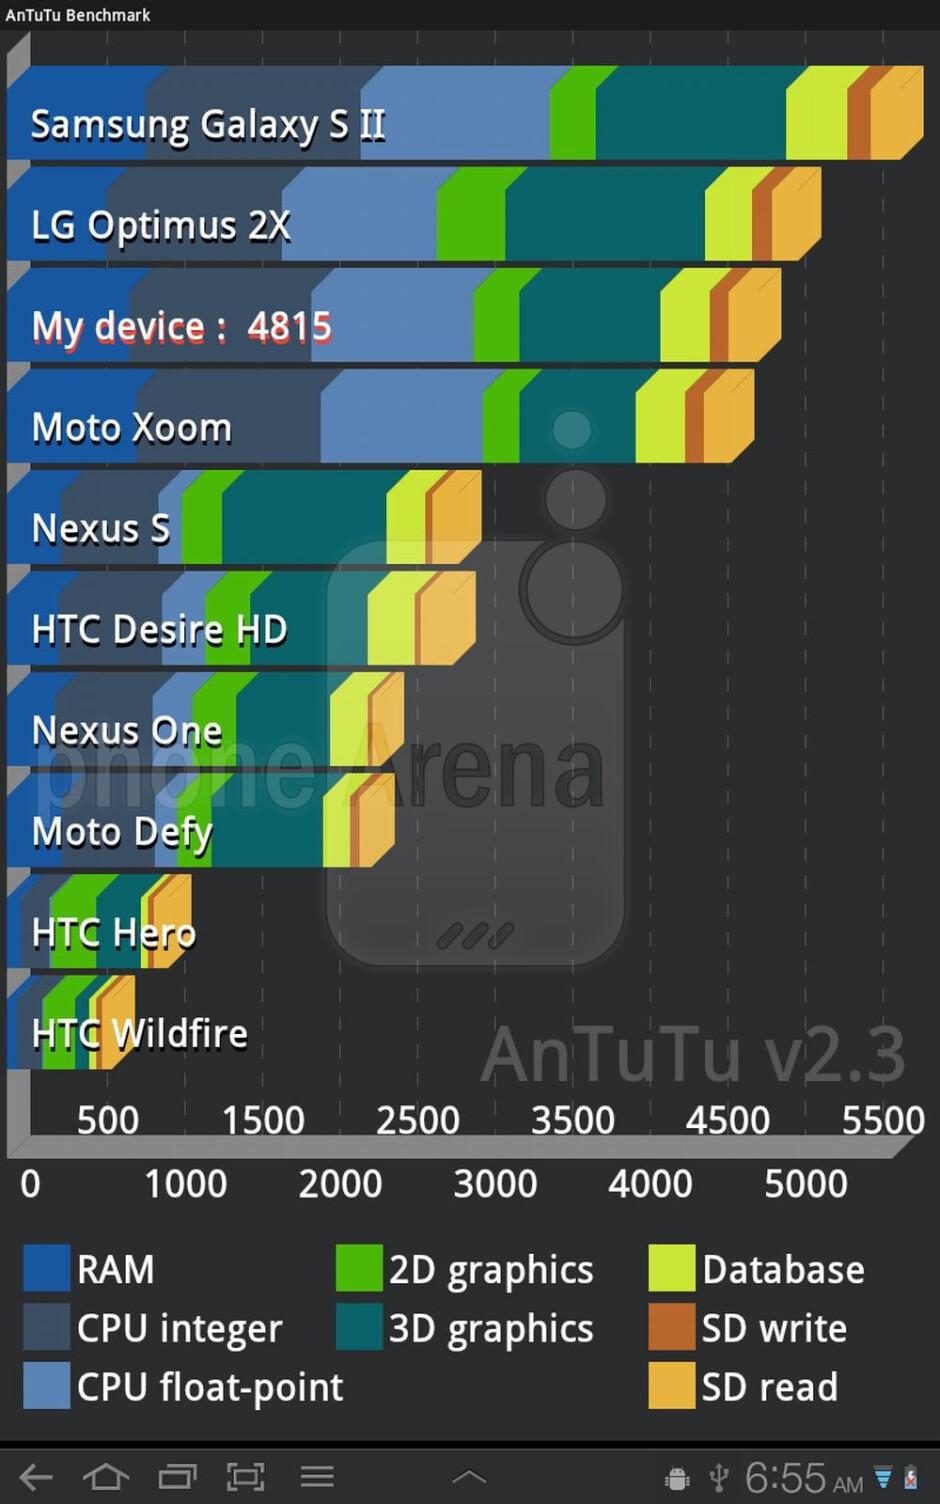 AnTutu benchmark results - Samsung Galaxy Tab 8.9 benchmark tests